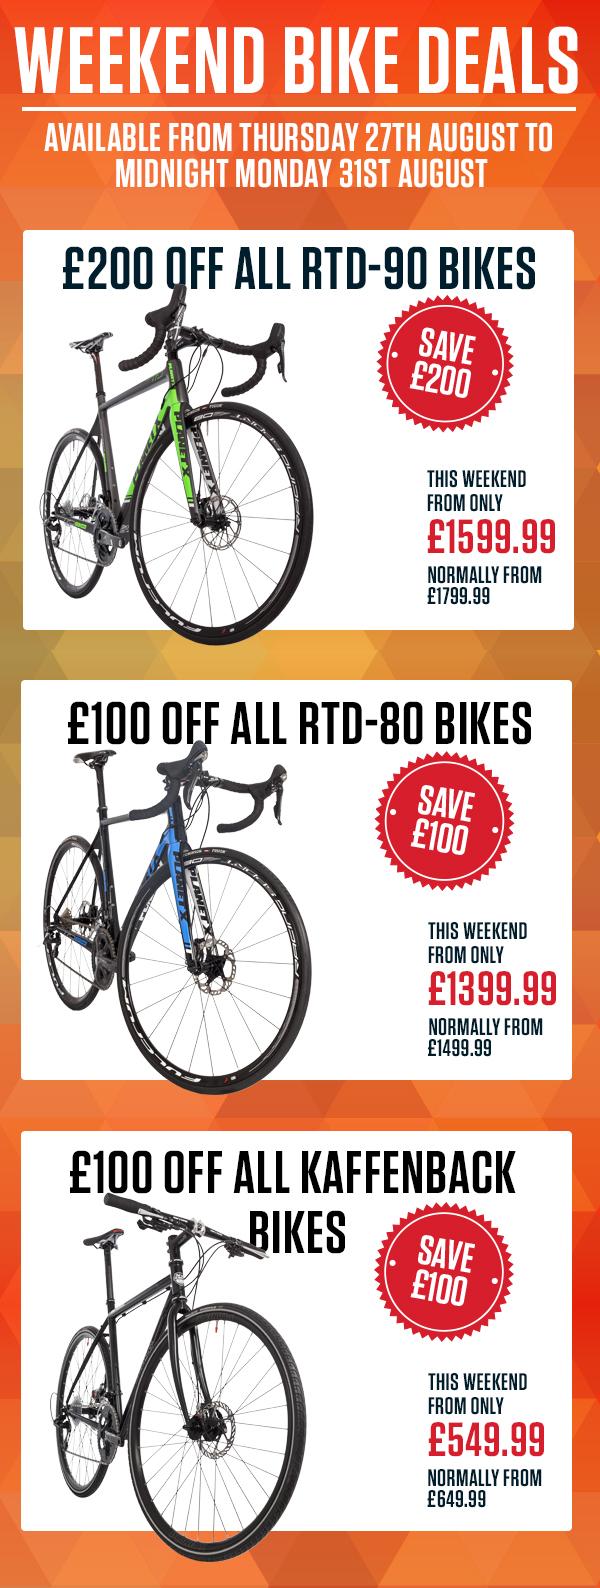 Weekend bike deal 28.8.15